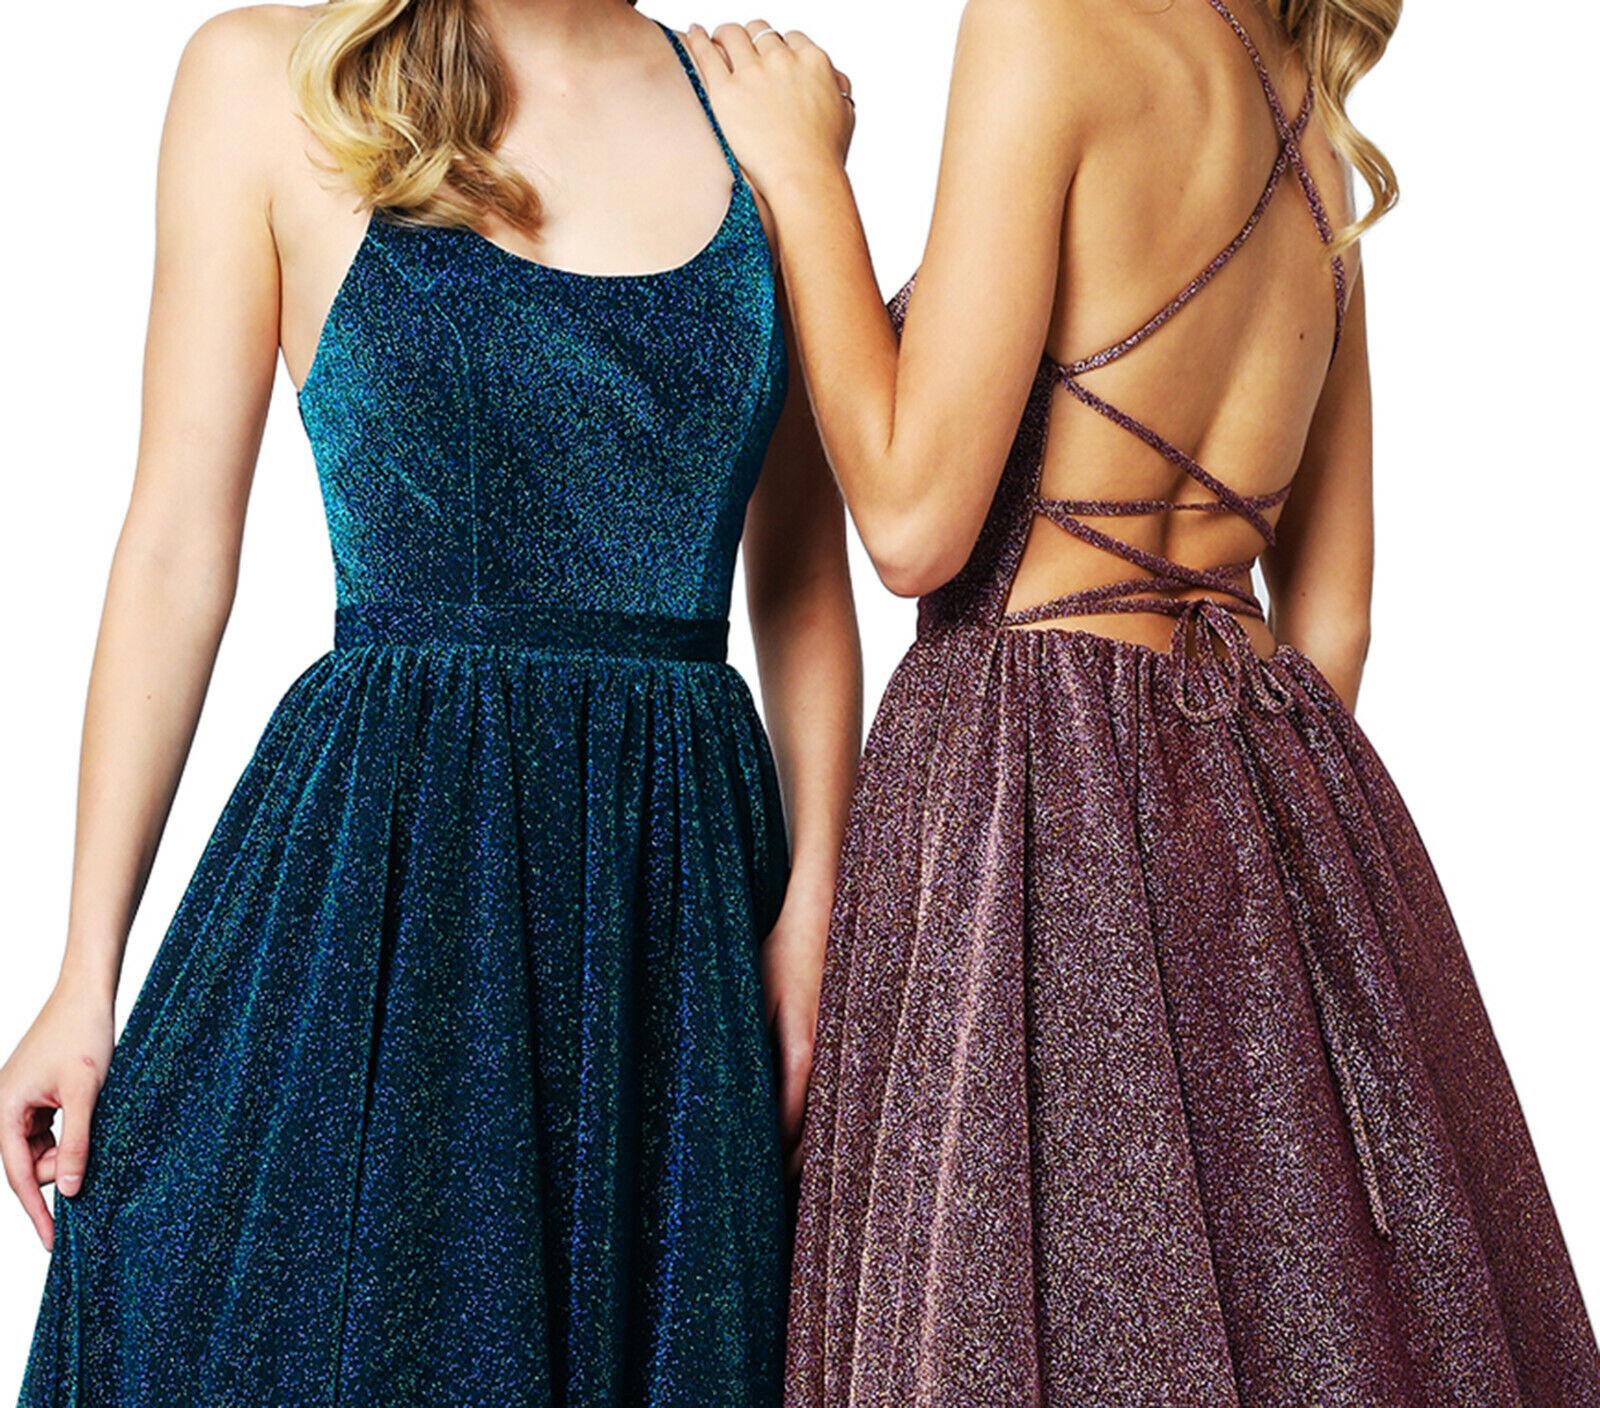 A-Linie Abendkleid Anlass Formell rot Carpet Tanz Classy Kleider